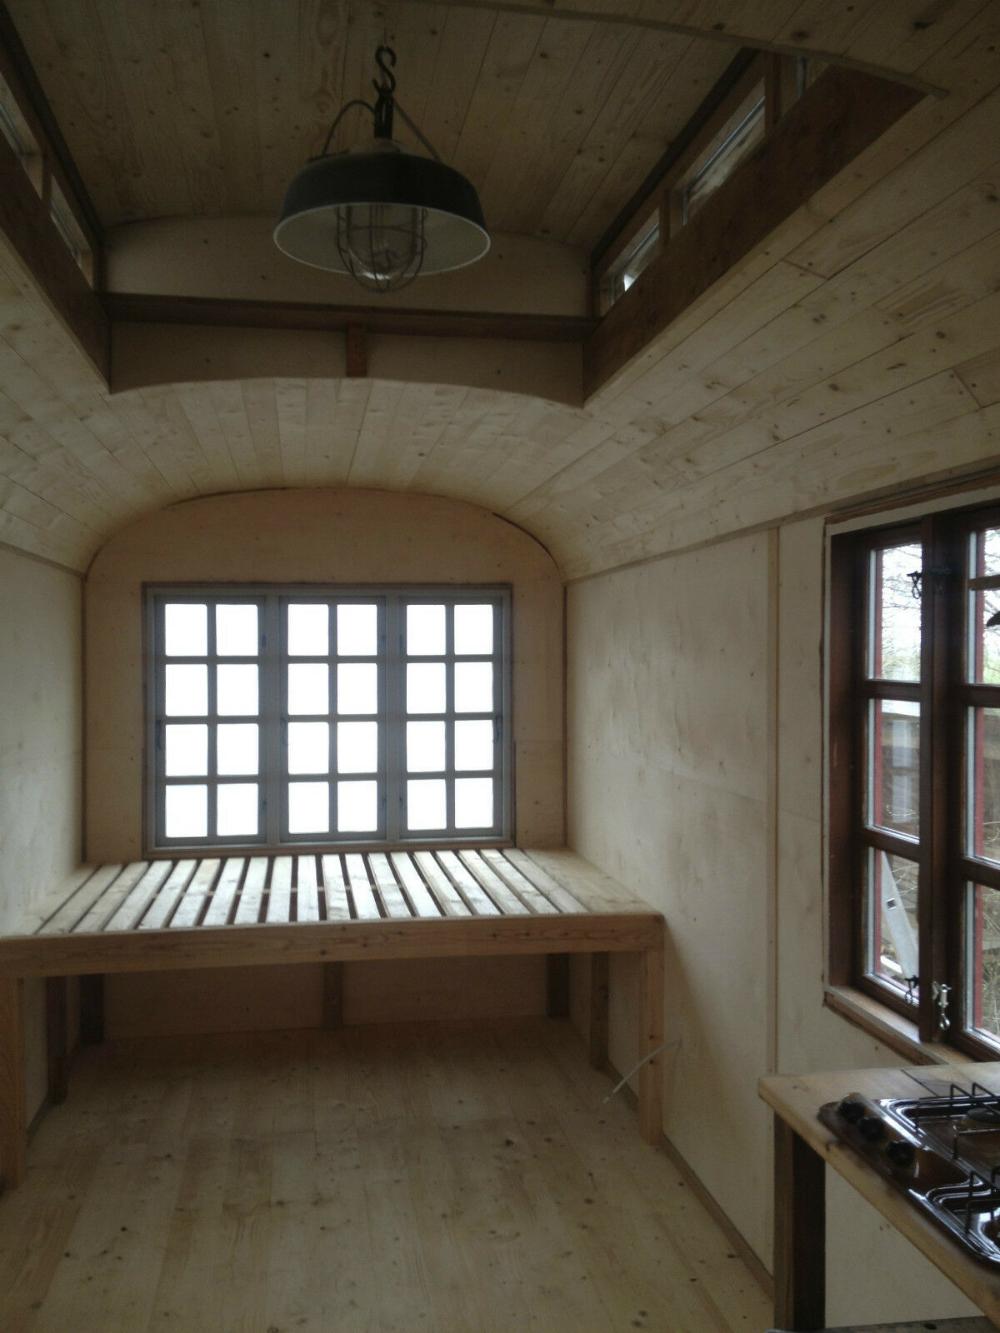 Apartment, trailer, circus wagon, studio, office